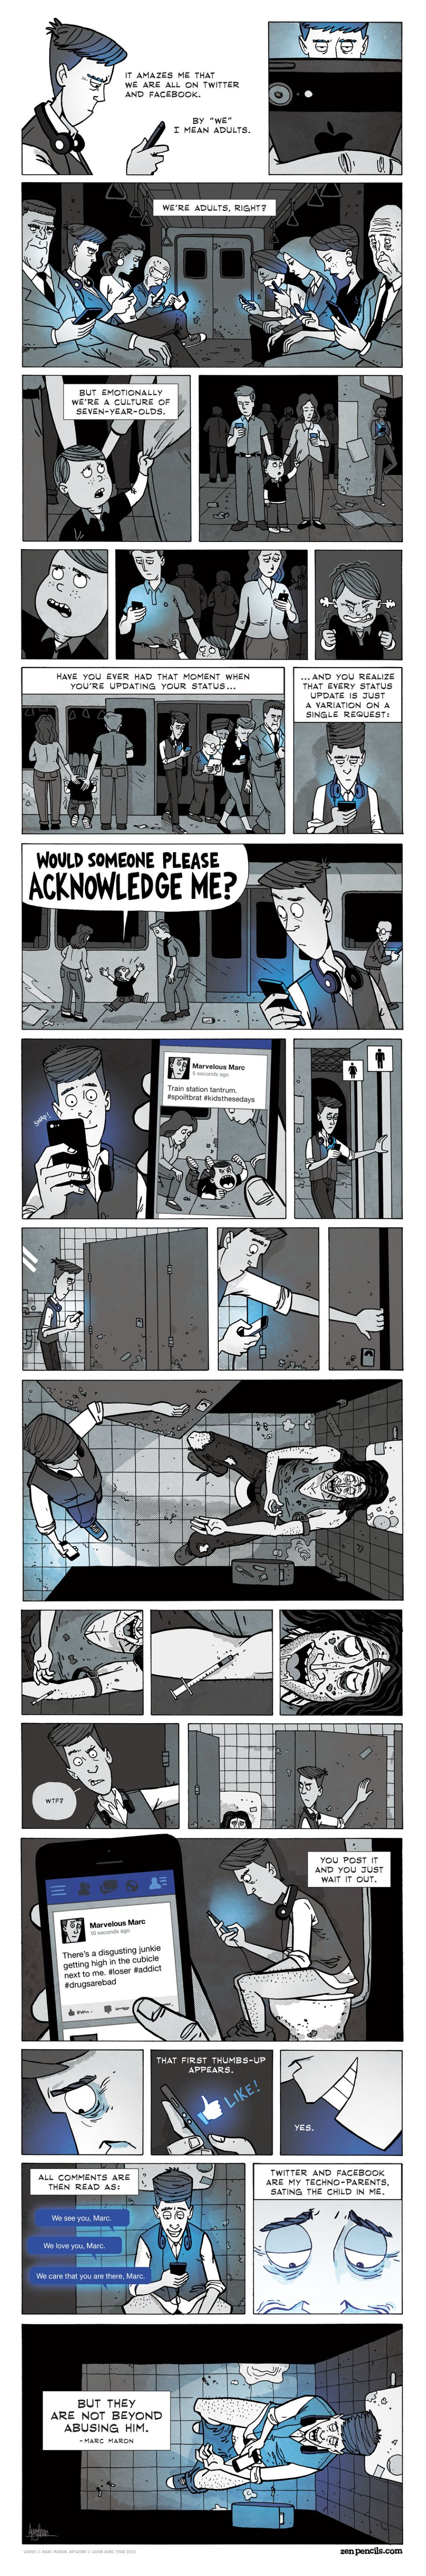 marc-maron-the-social-media-generation-comic